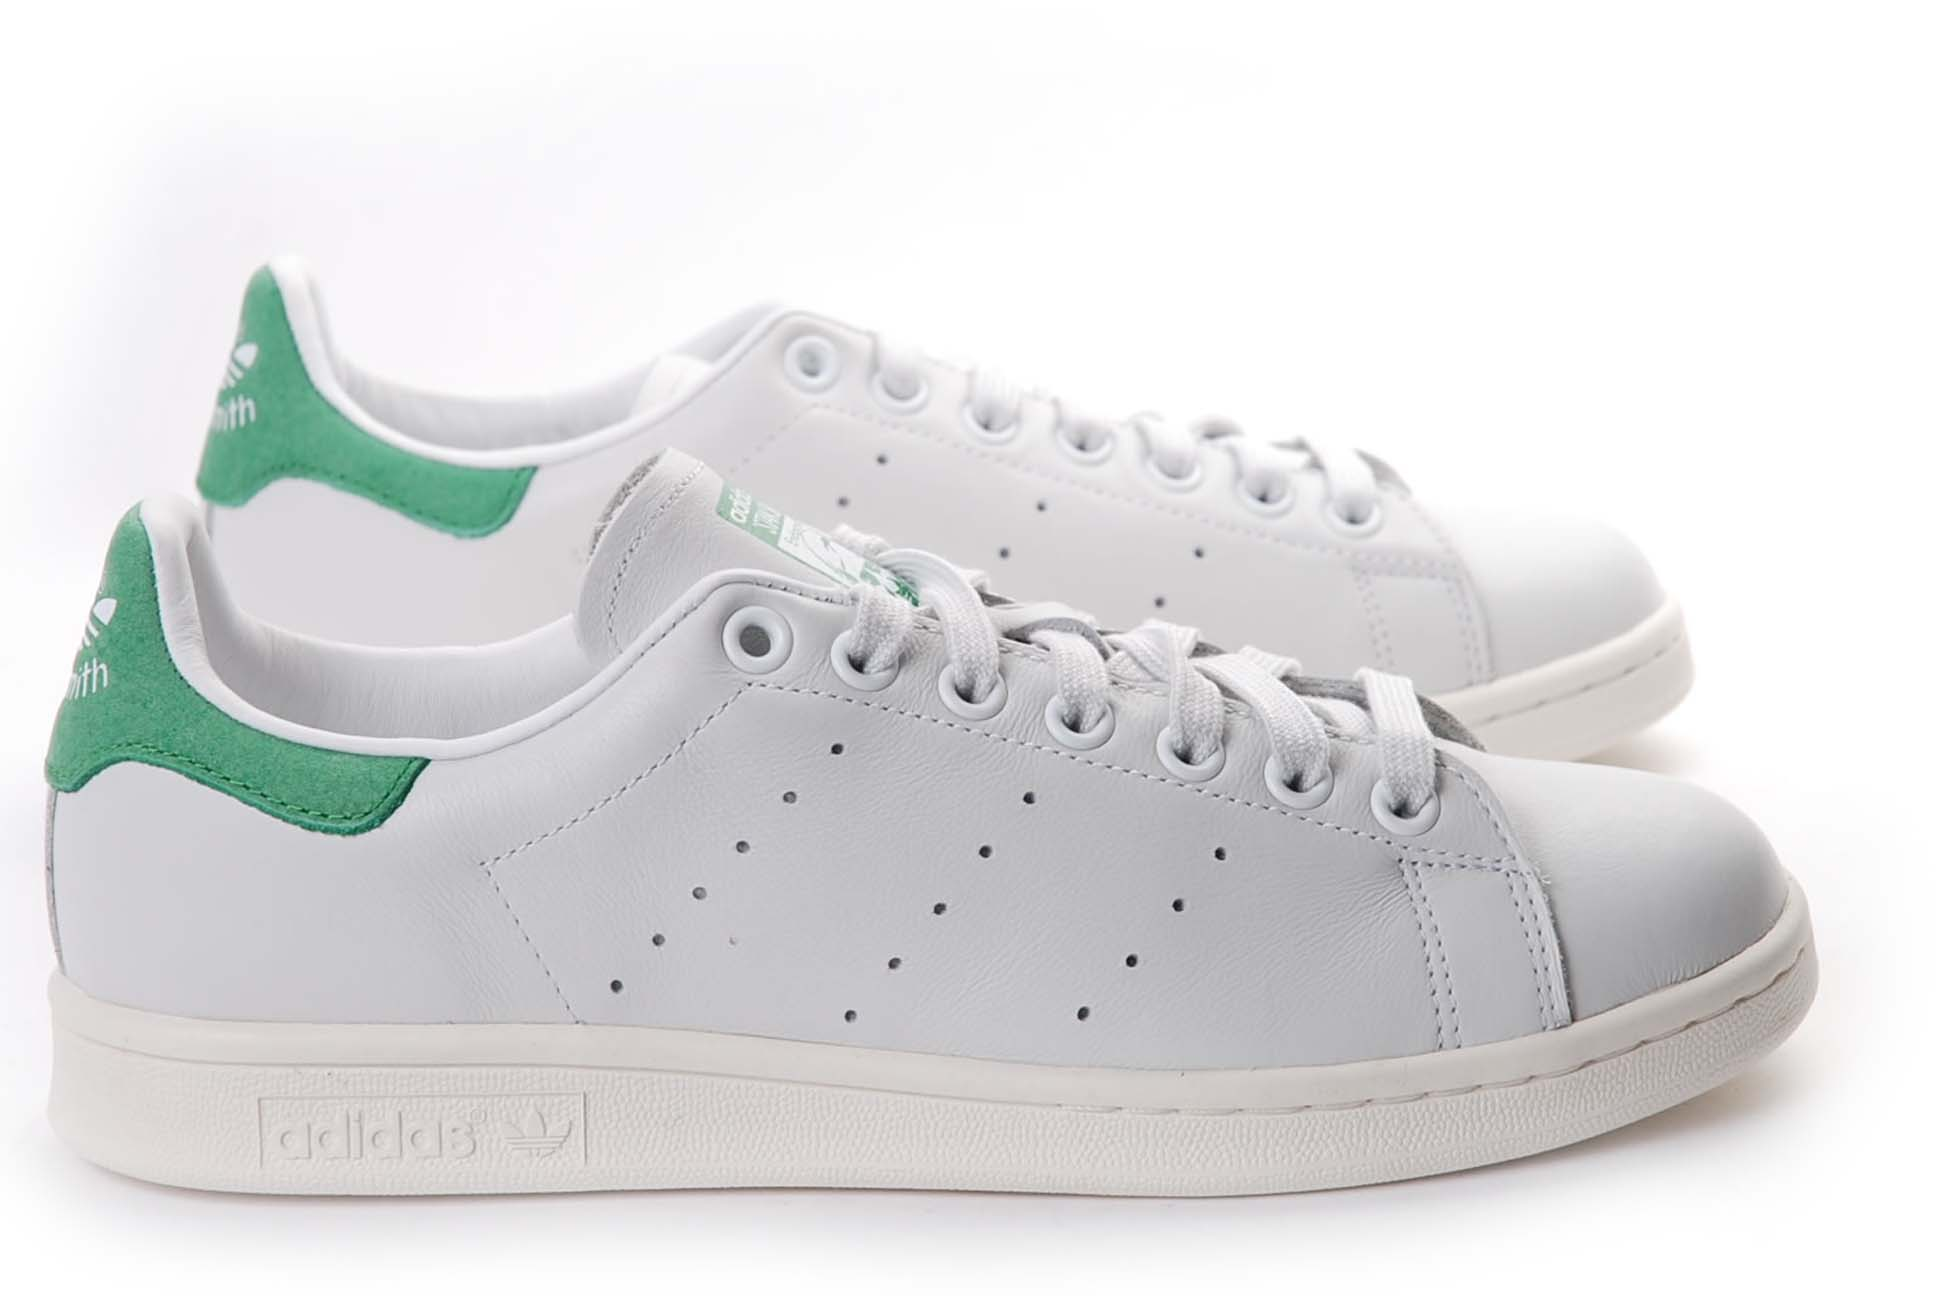 adidas stan smith blanche et verte Avis en ligne 91863cba98f7